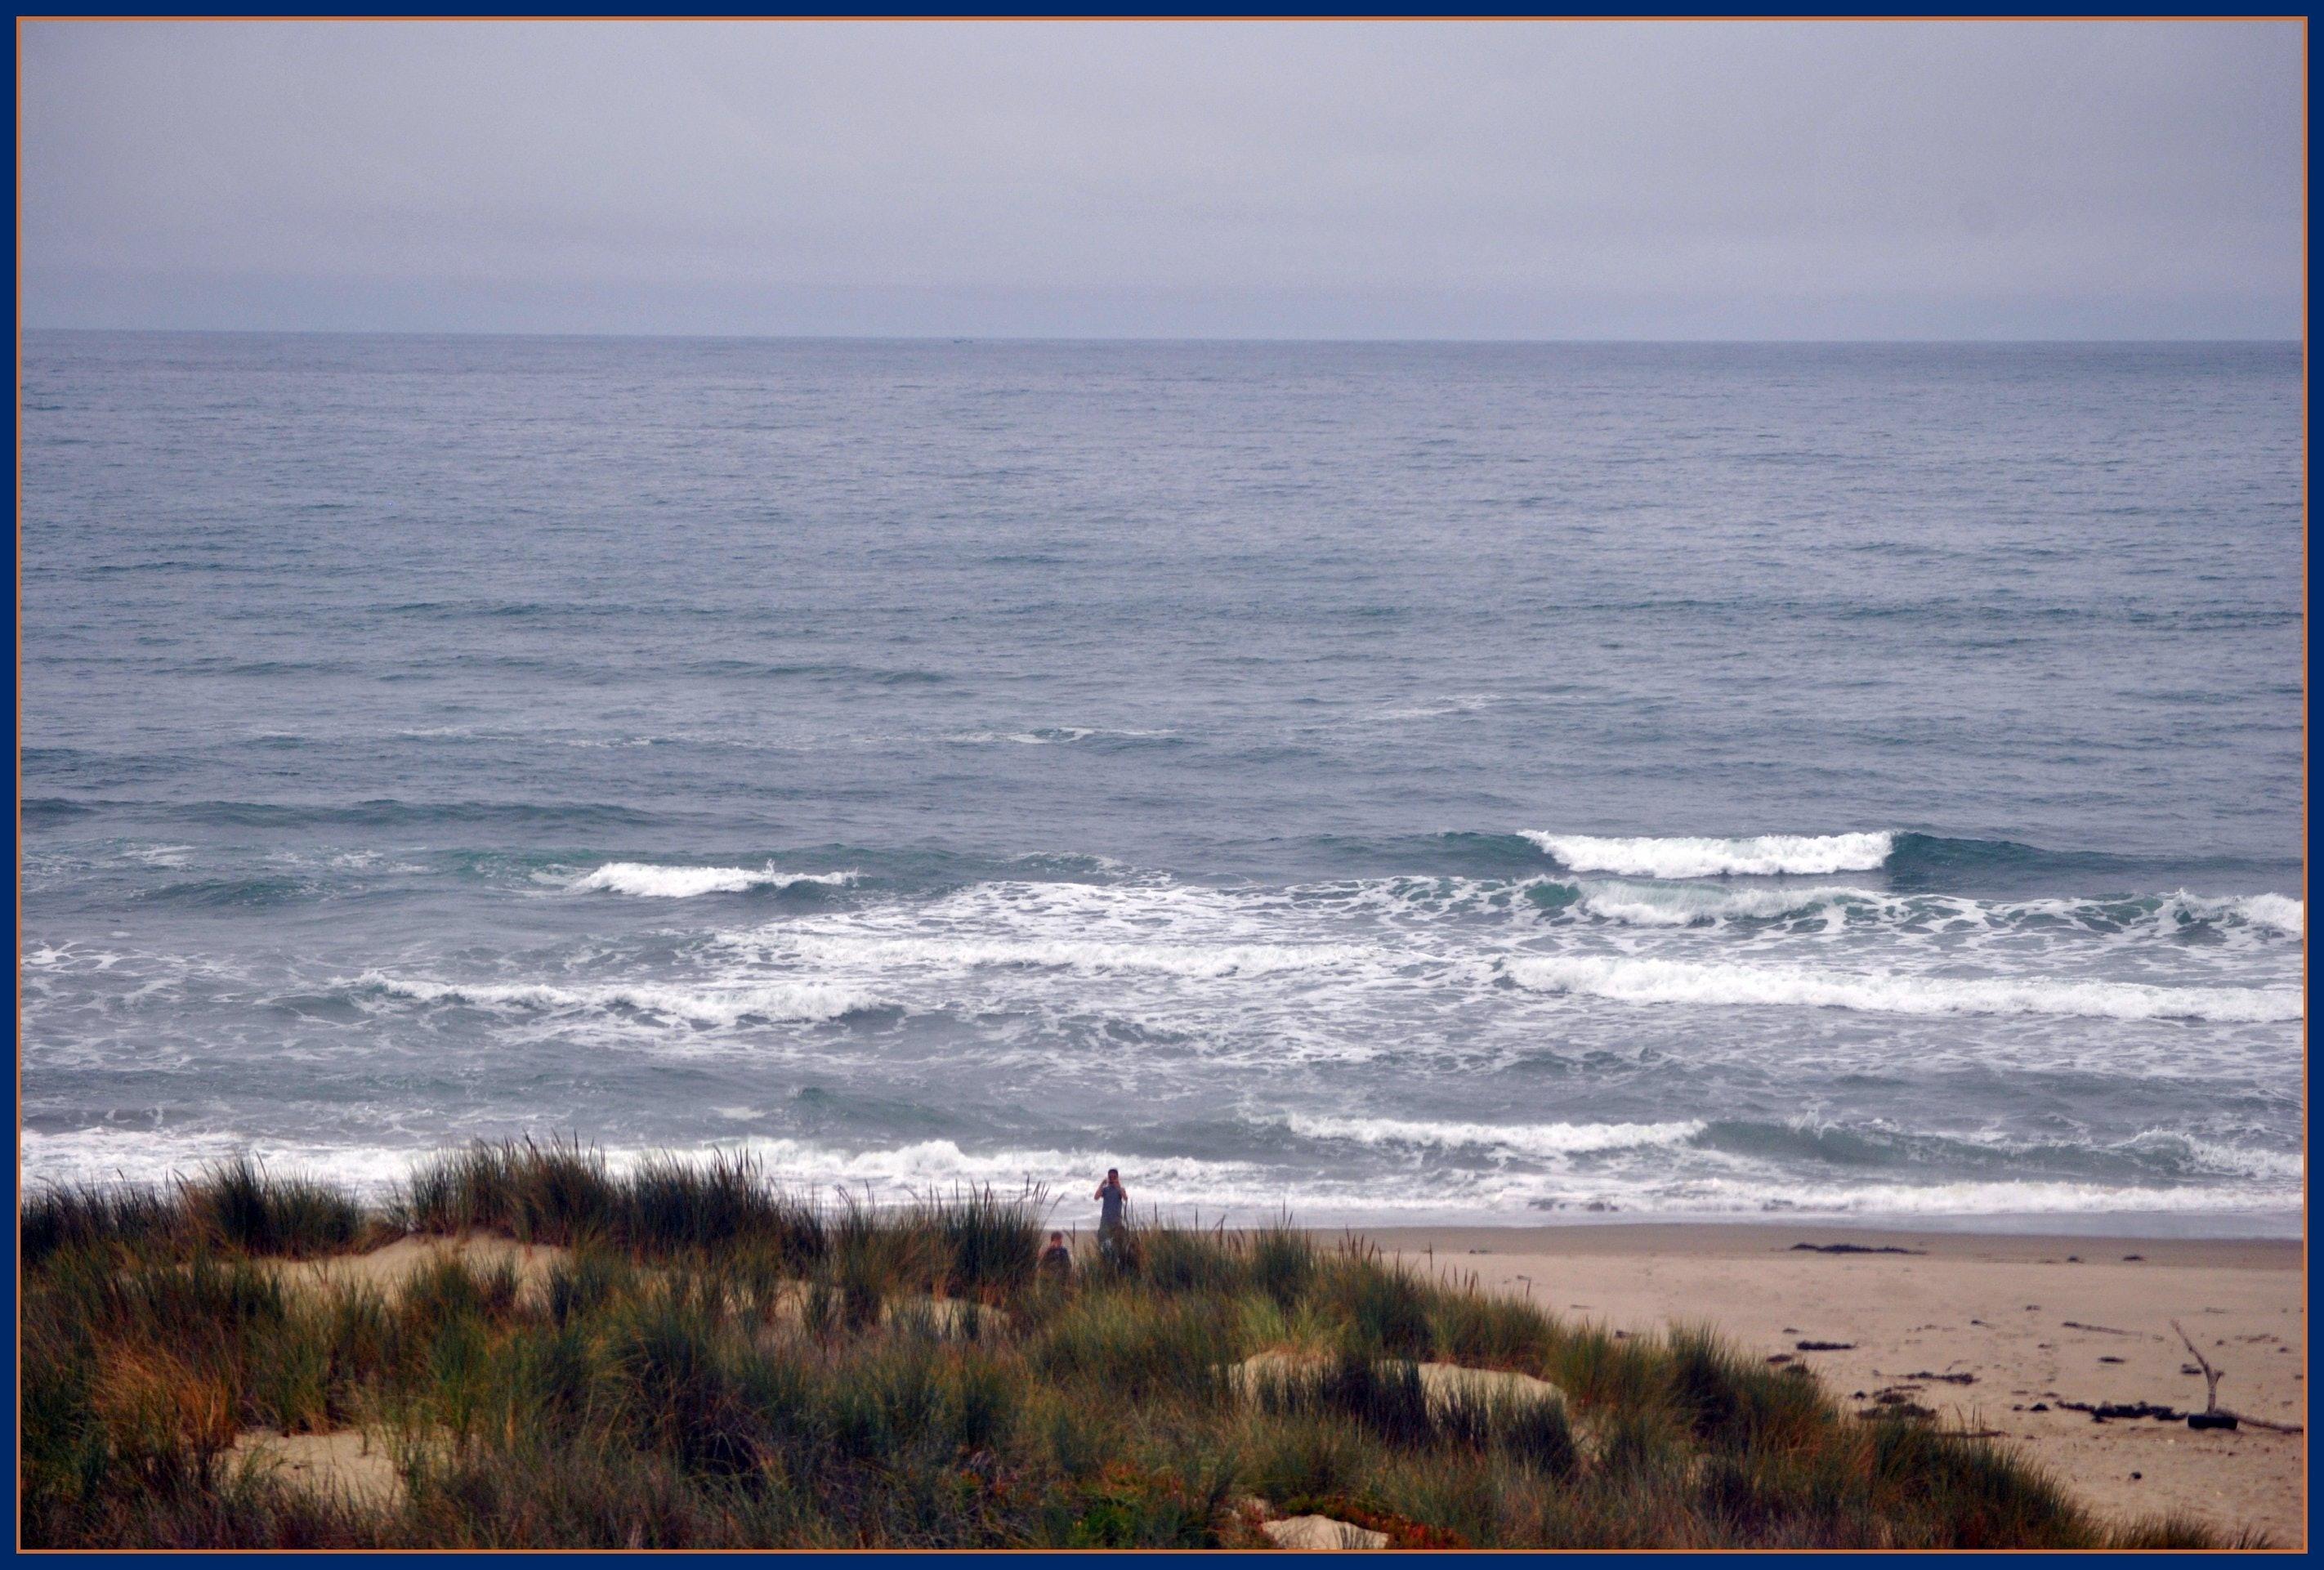 Surf Beach California Is An Epicenter